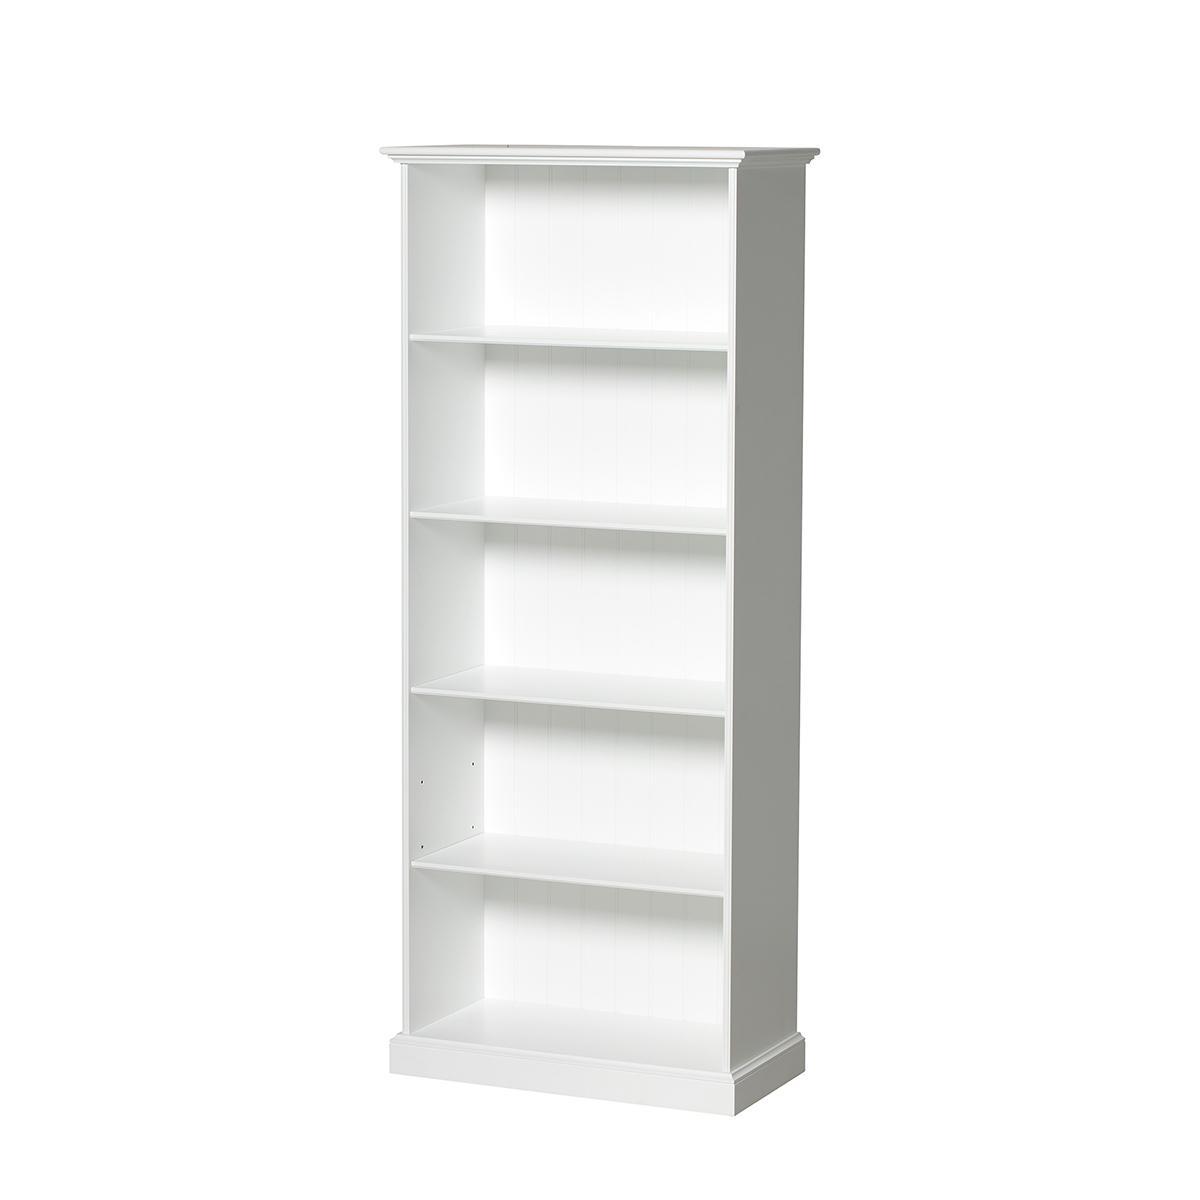 Estantería alta SEASIDE Oliver Furniture blanco